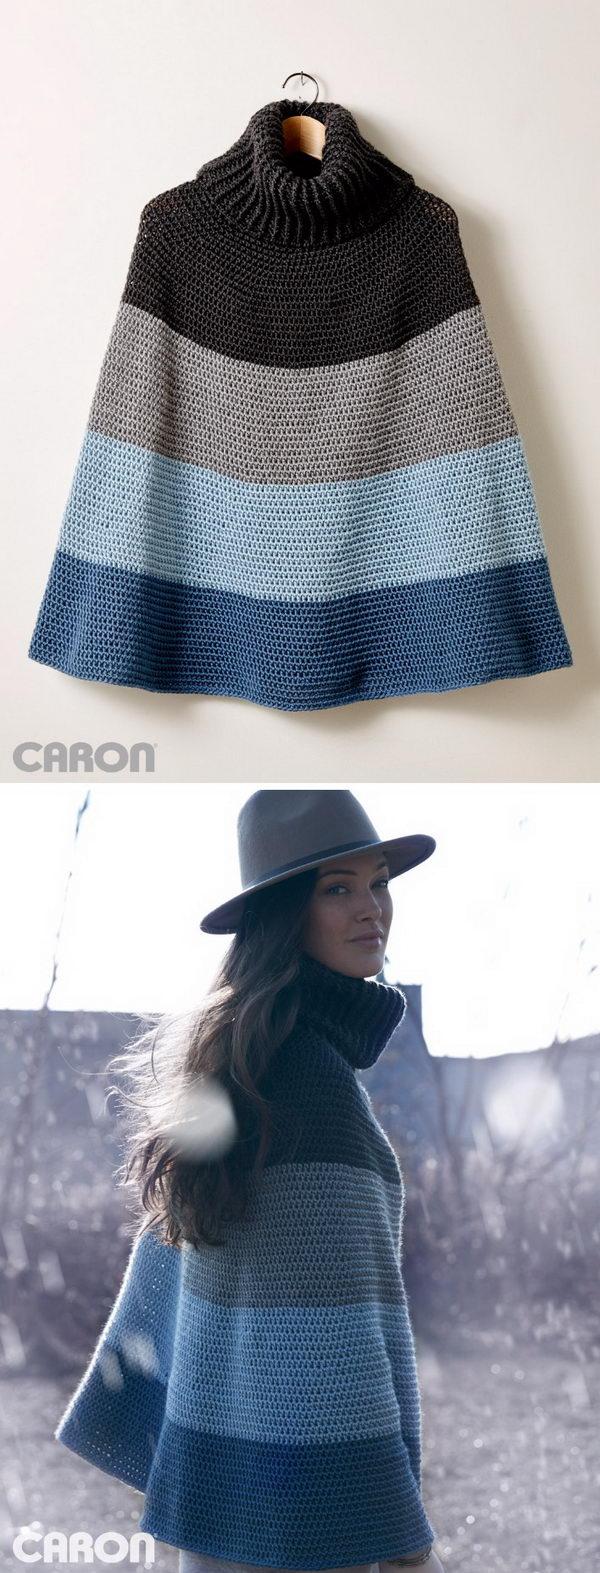 10 crochet women capes poncho ideas - 20 Crochet Women Capes and Poncho Ideas